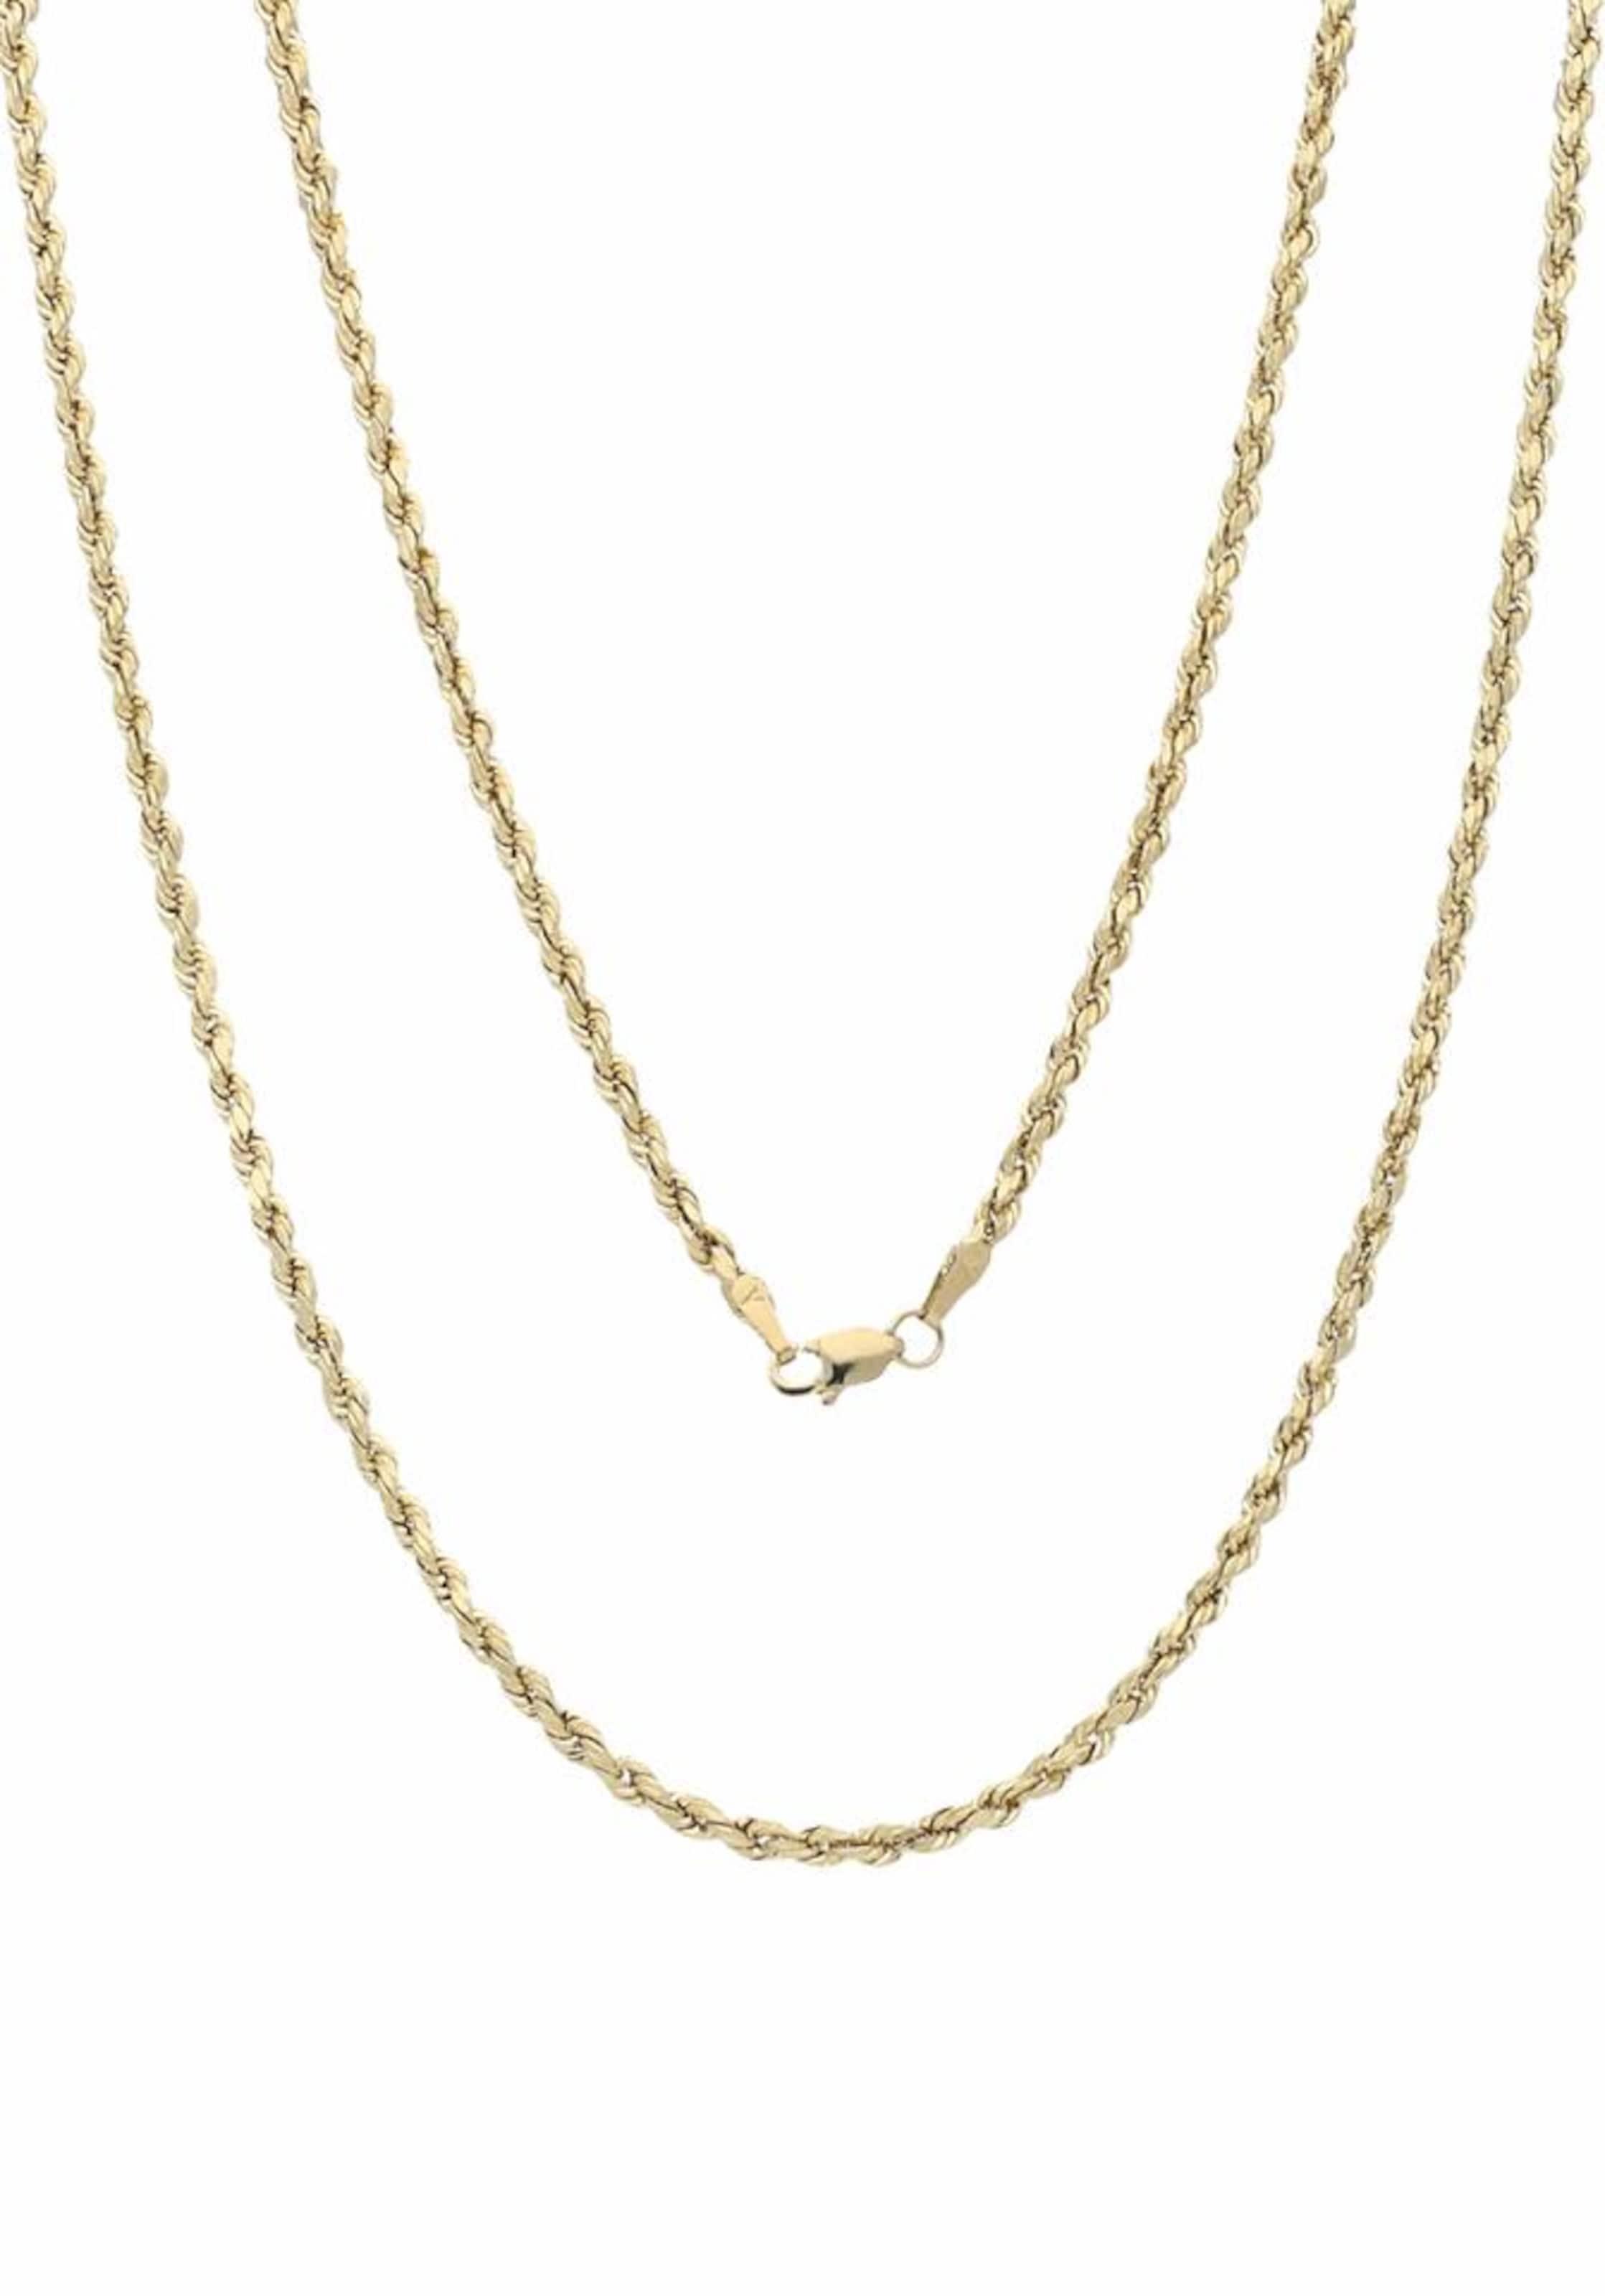 FIRETTI Goldkette 'Kordelkette' Outlet Brandneue Unisex Billig Billig Marktfähig Günstiger Preis 2rfDoPI